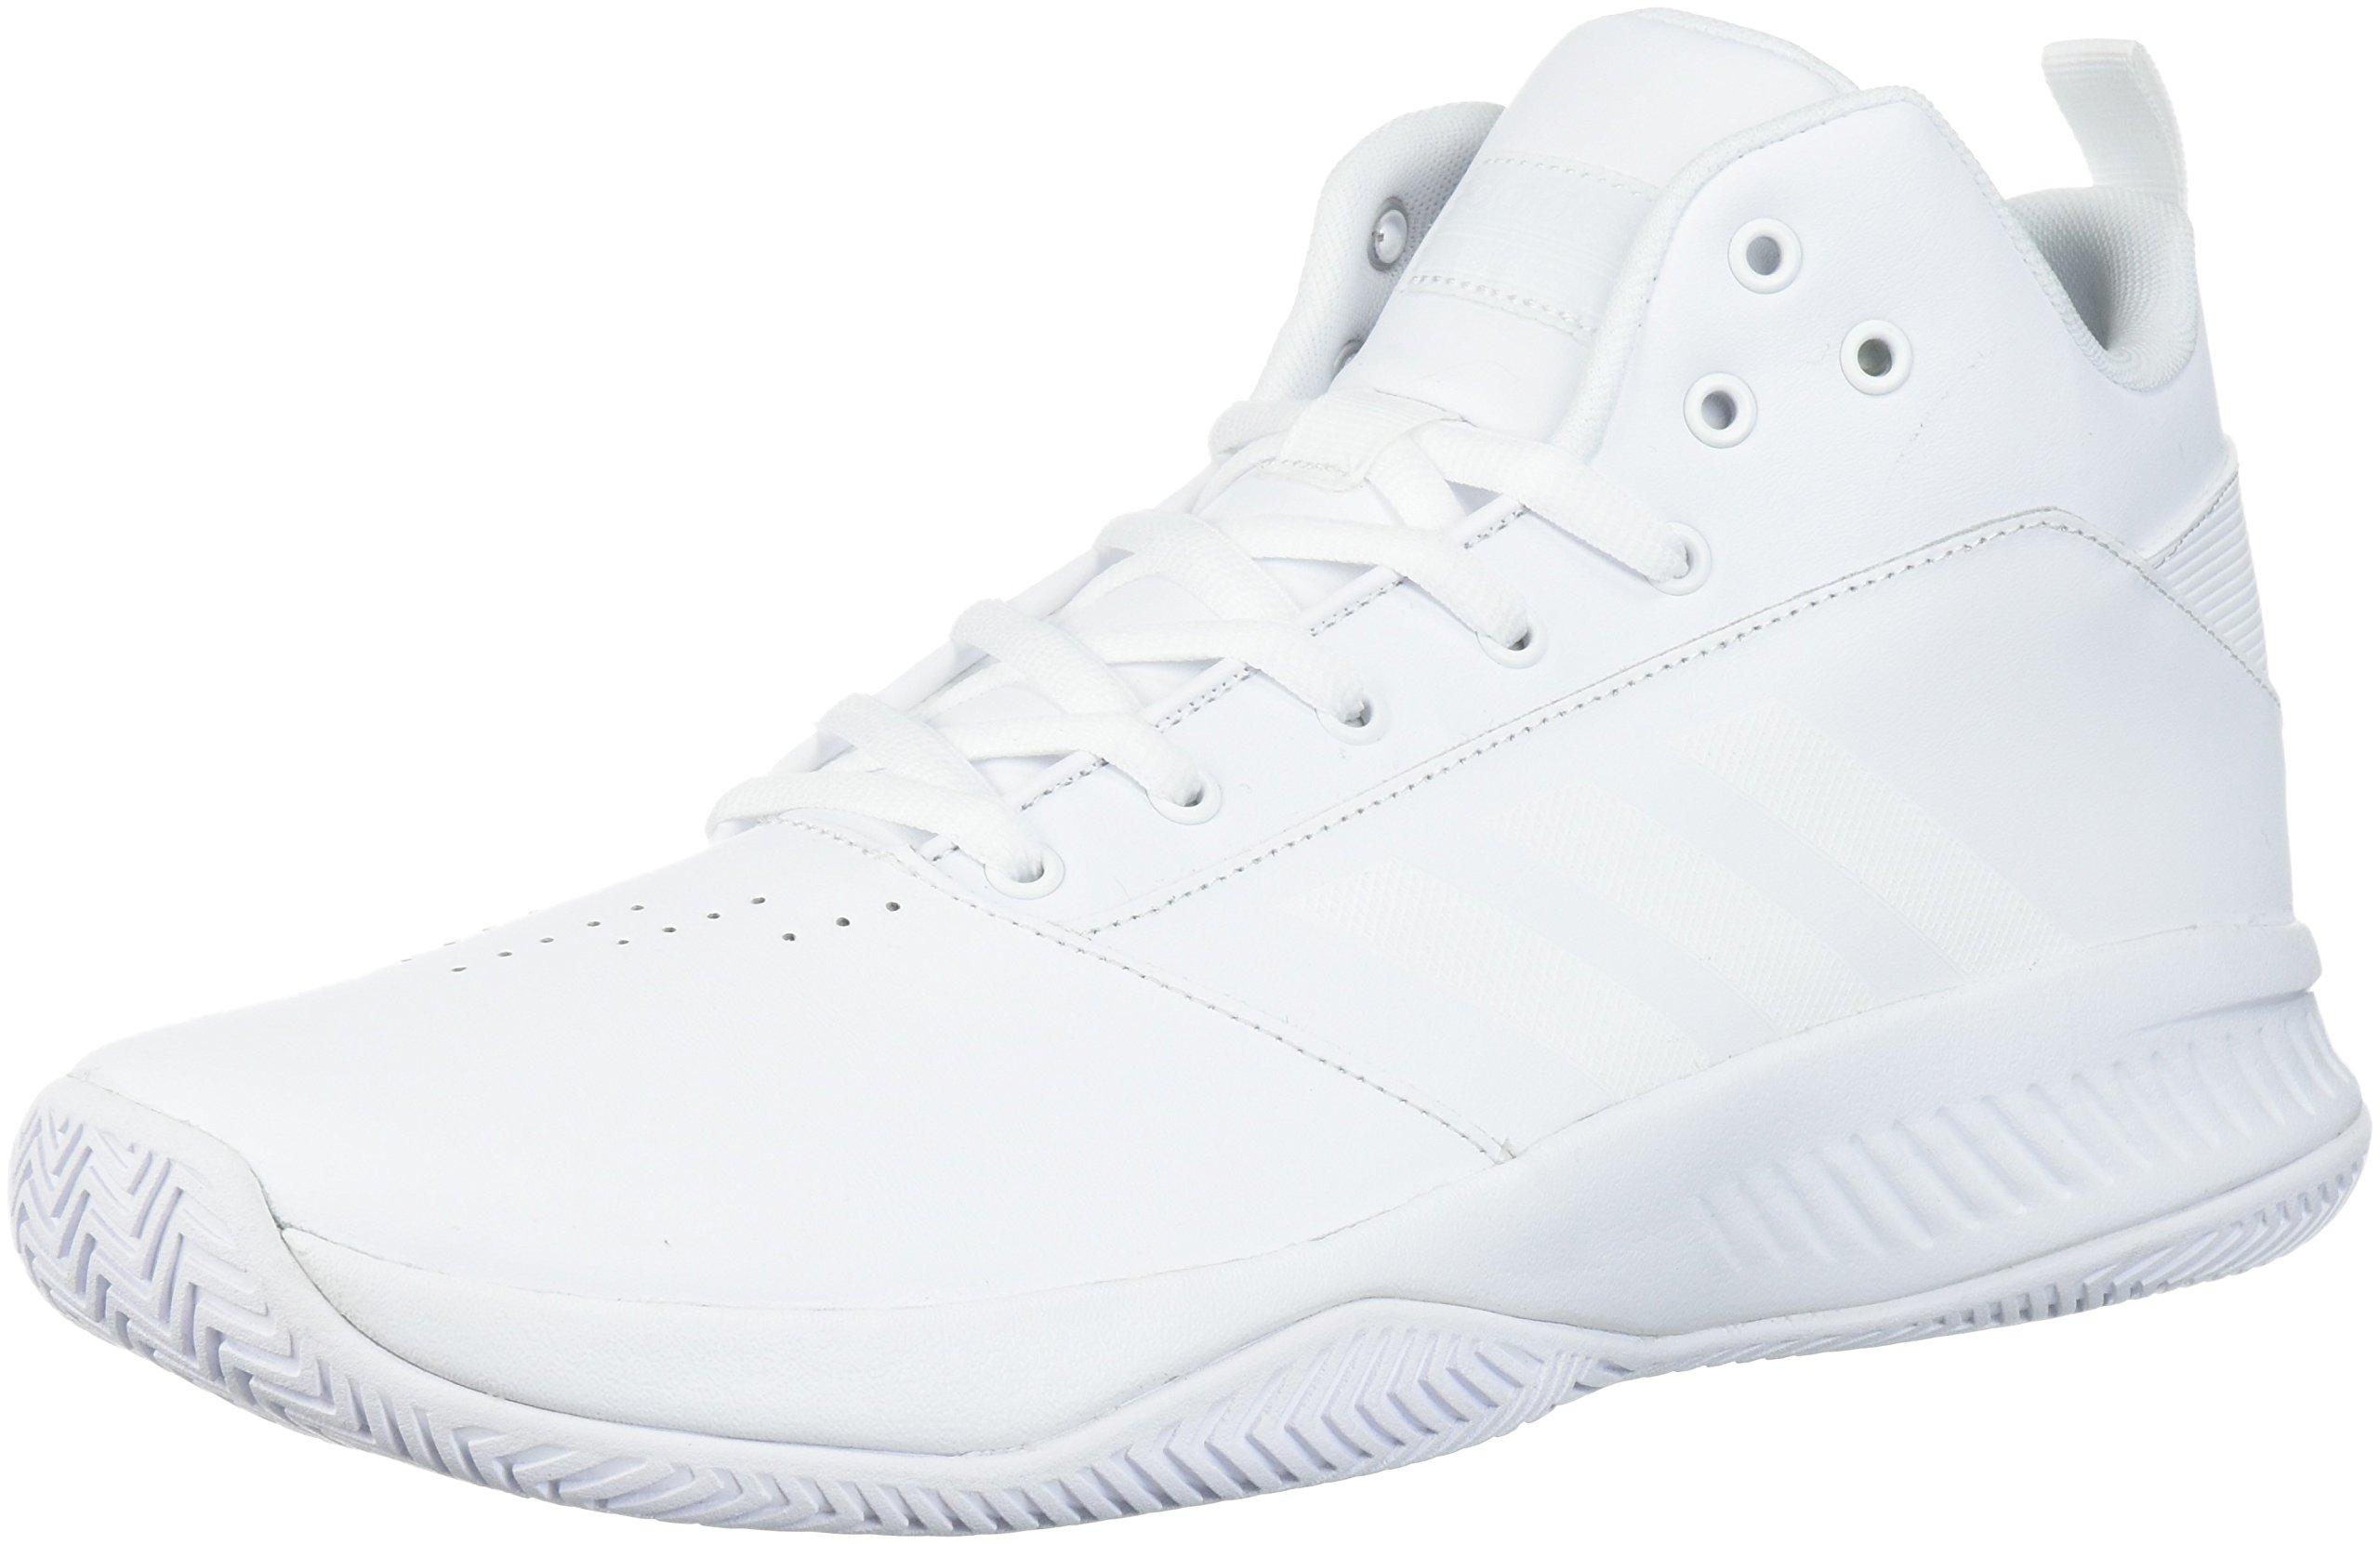 competitive price 44915 51c39 Galleon - Adidas Mens CF Ilation 2.0, WhiteWhiteWhite, 7.5 M